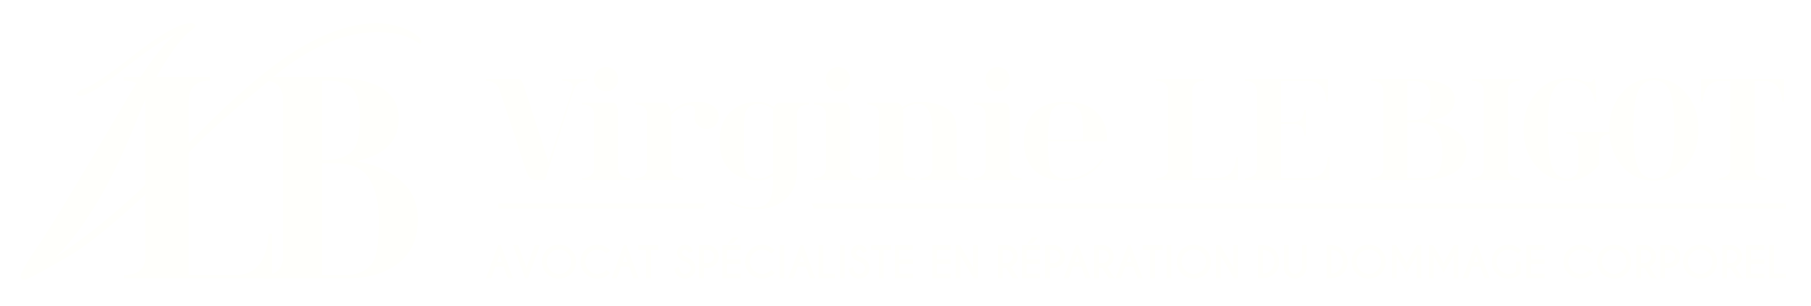 Cabinet Le Bigot